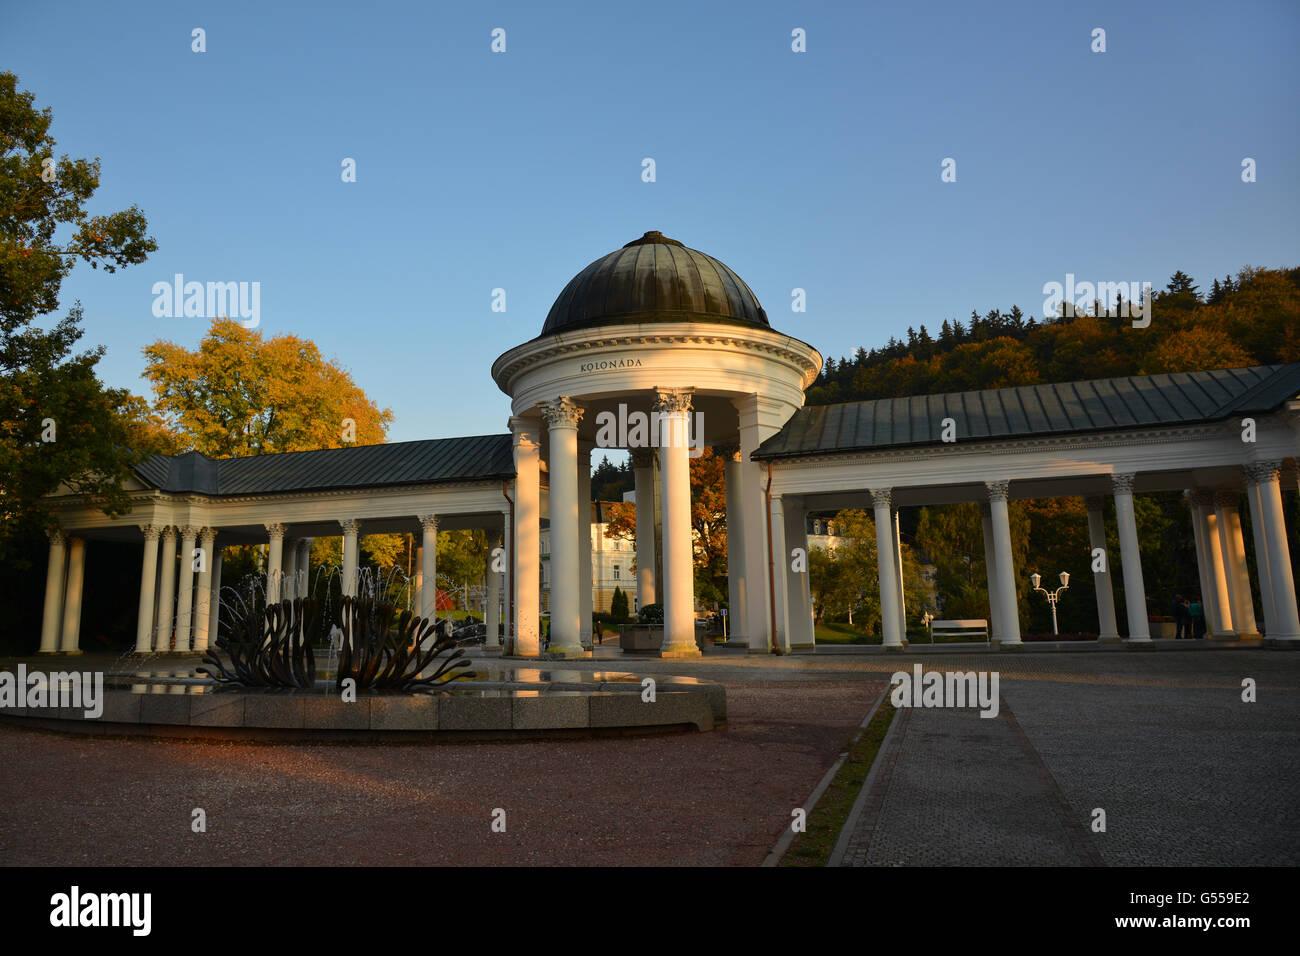 Pavilon Karolinina pramene - Stock Image